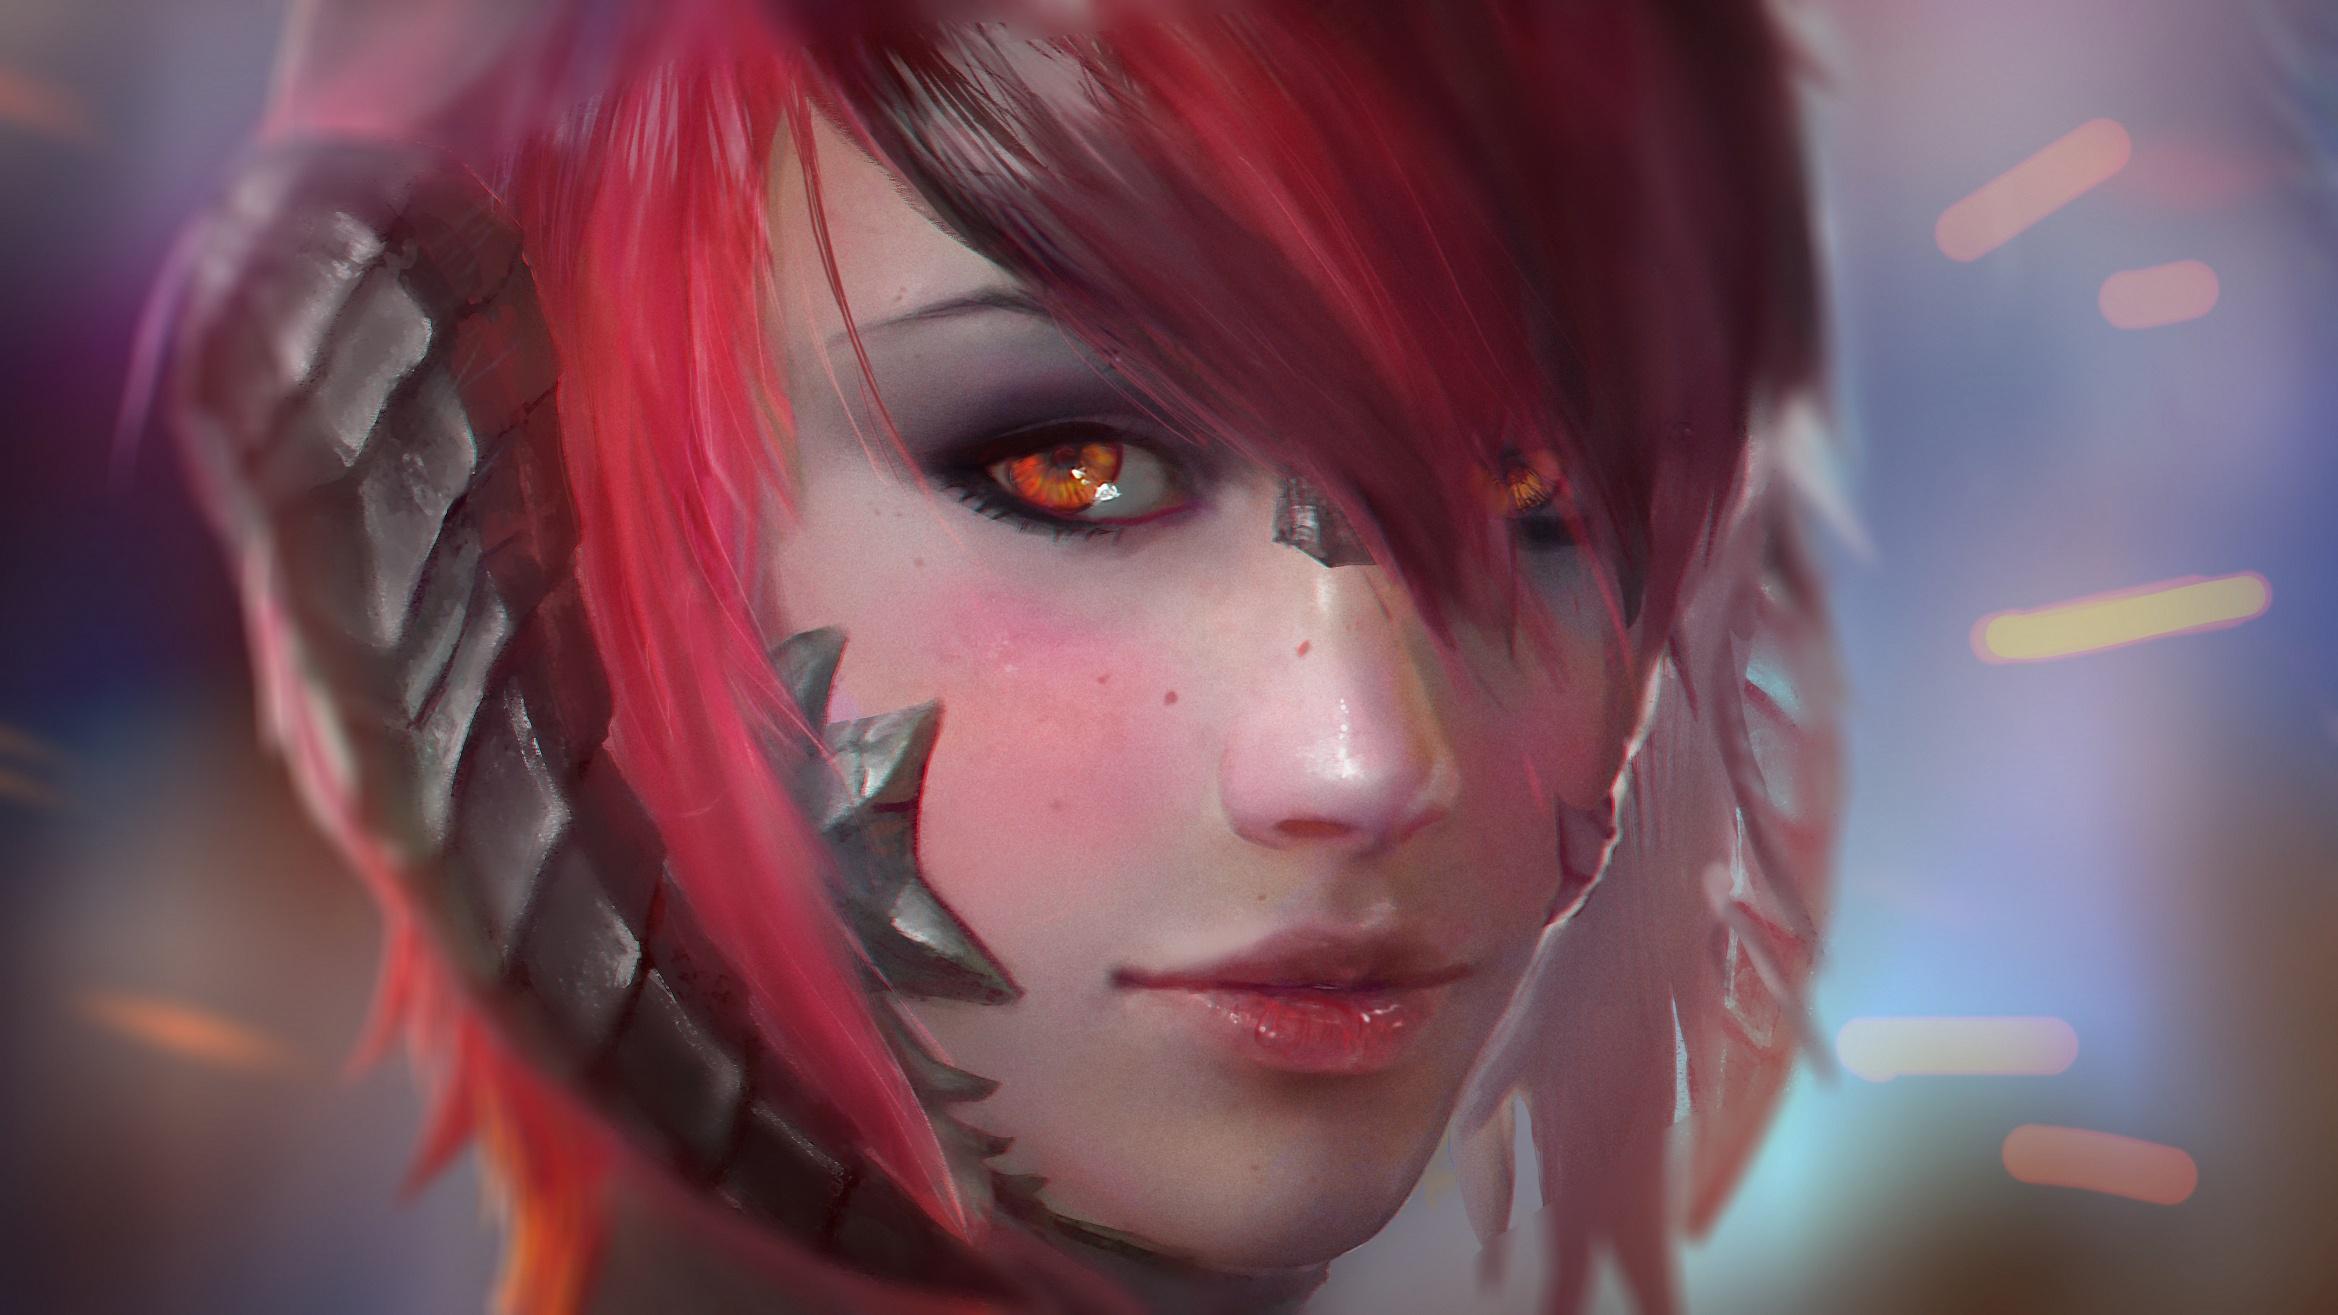 fantasy short hair orange eyes girl, hd fantasy girls, 4k wallpapers